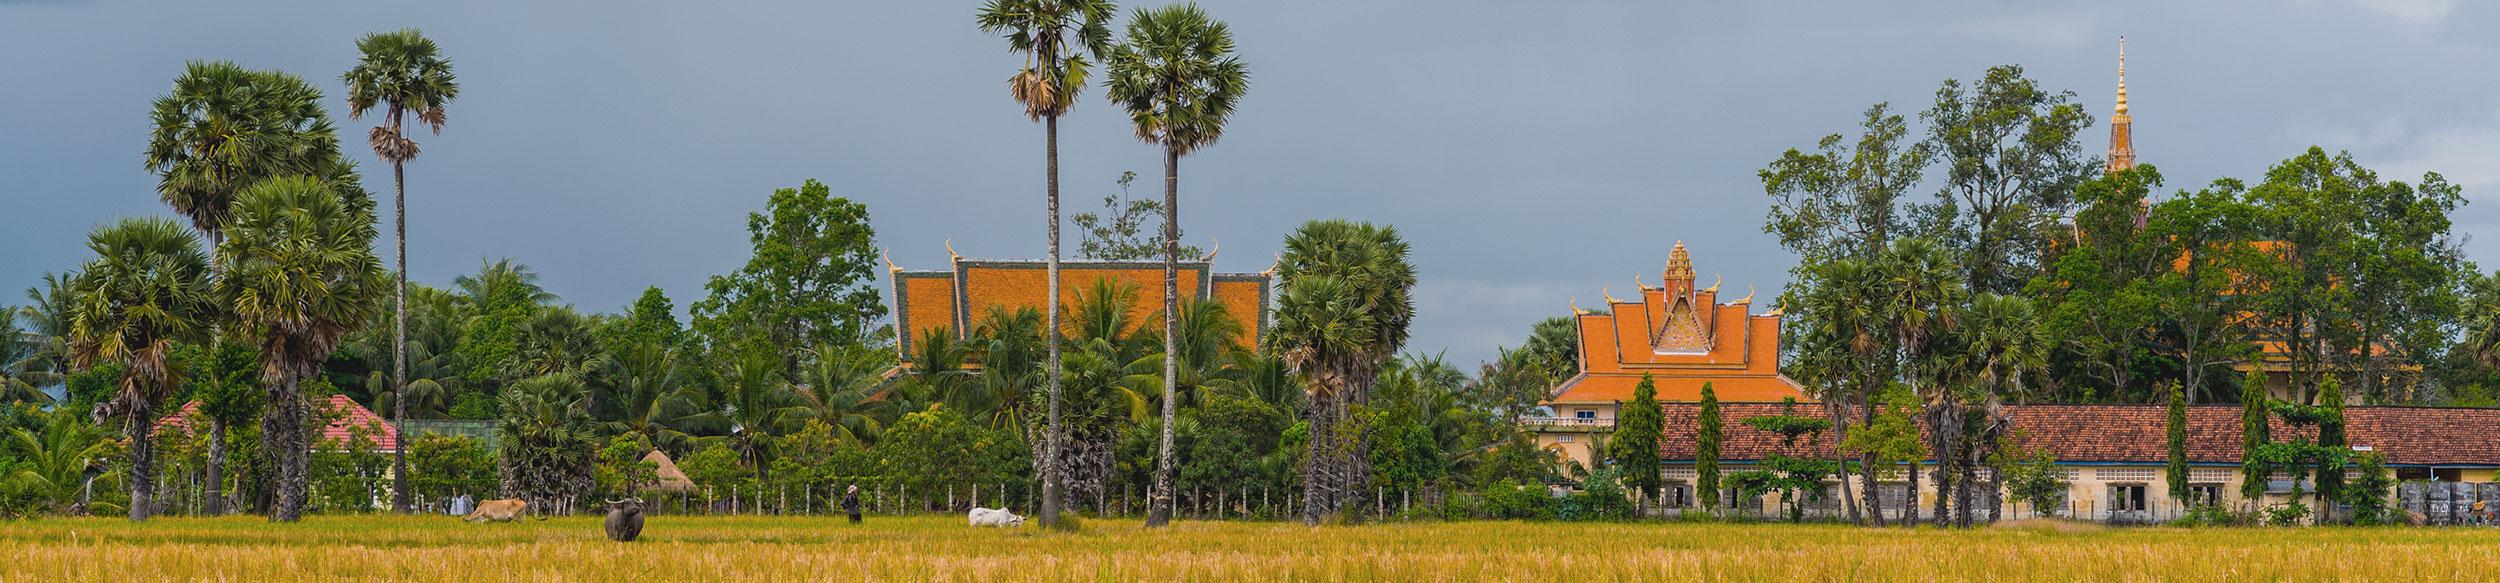 Découvrir Kampot avec Carnets d'Asie